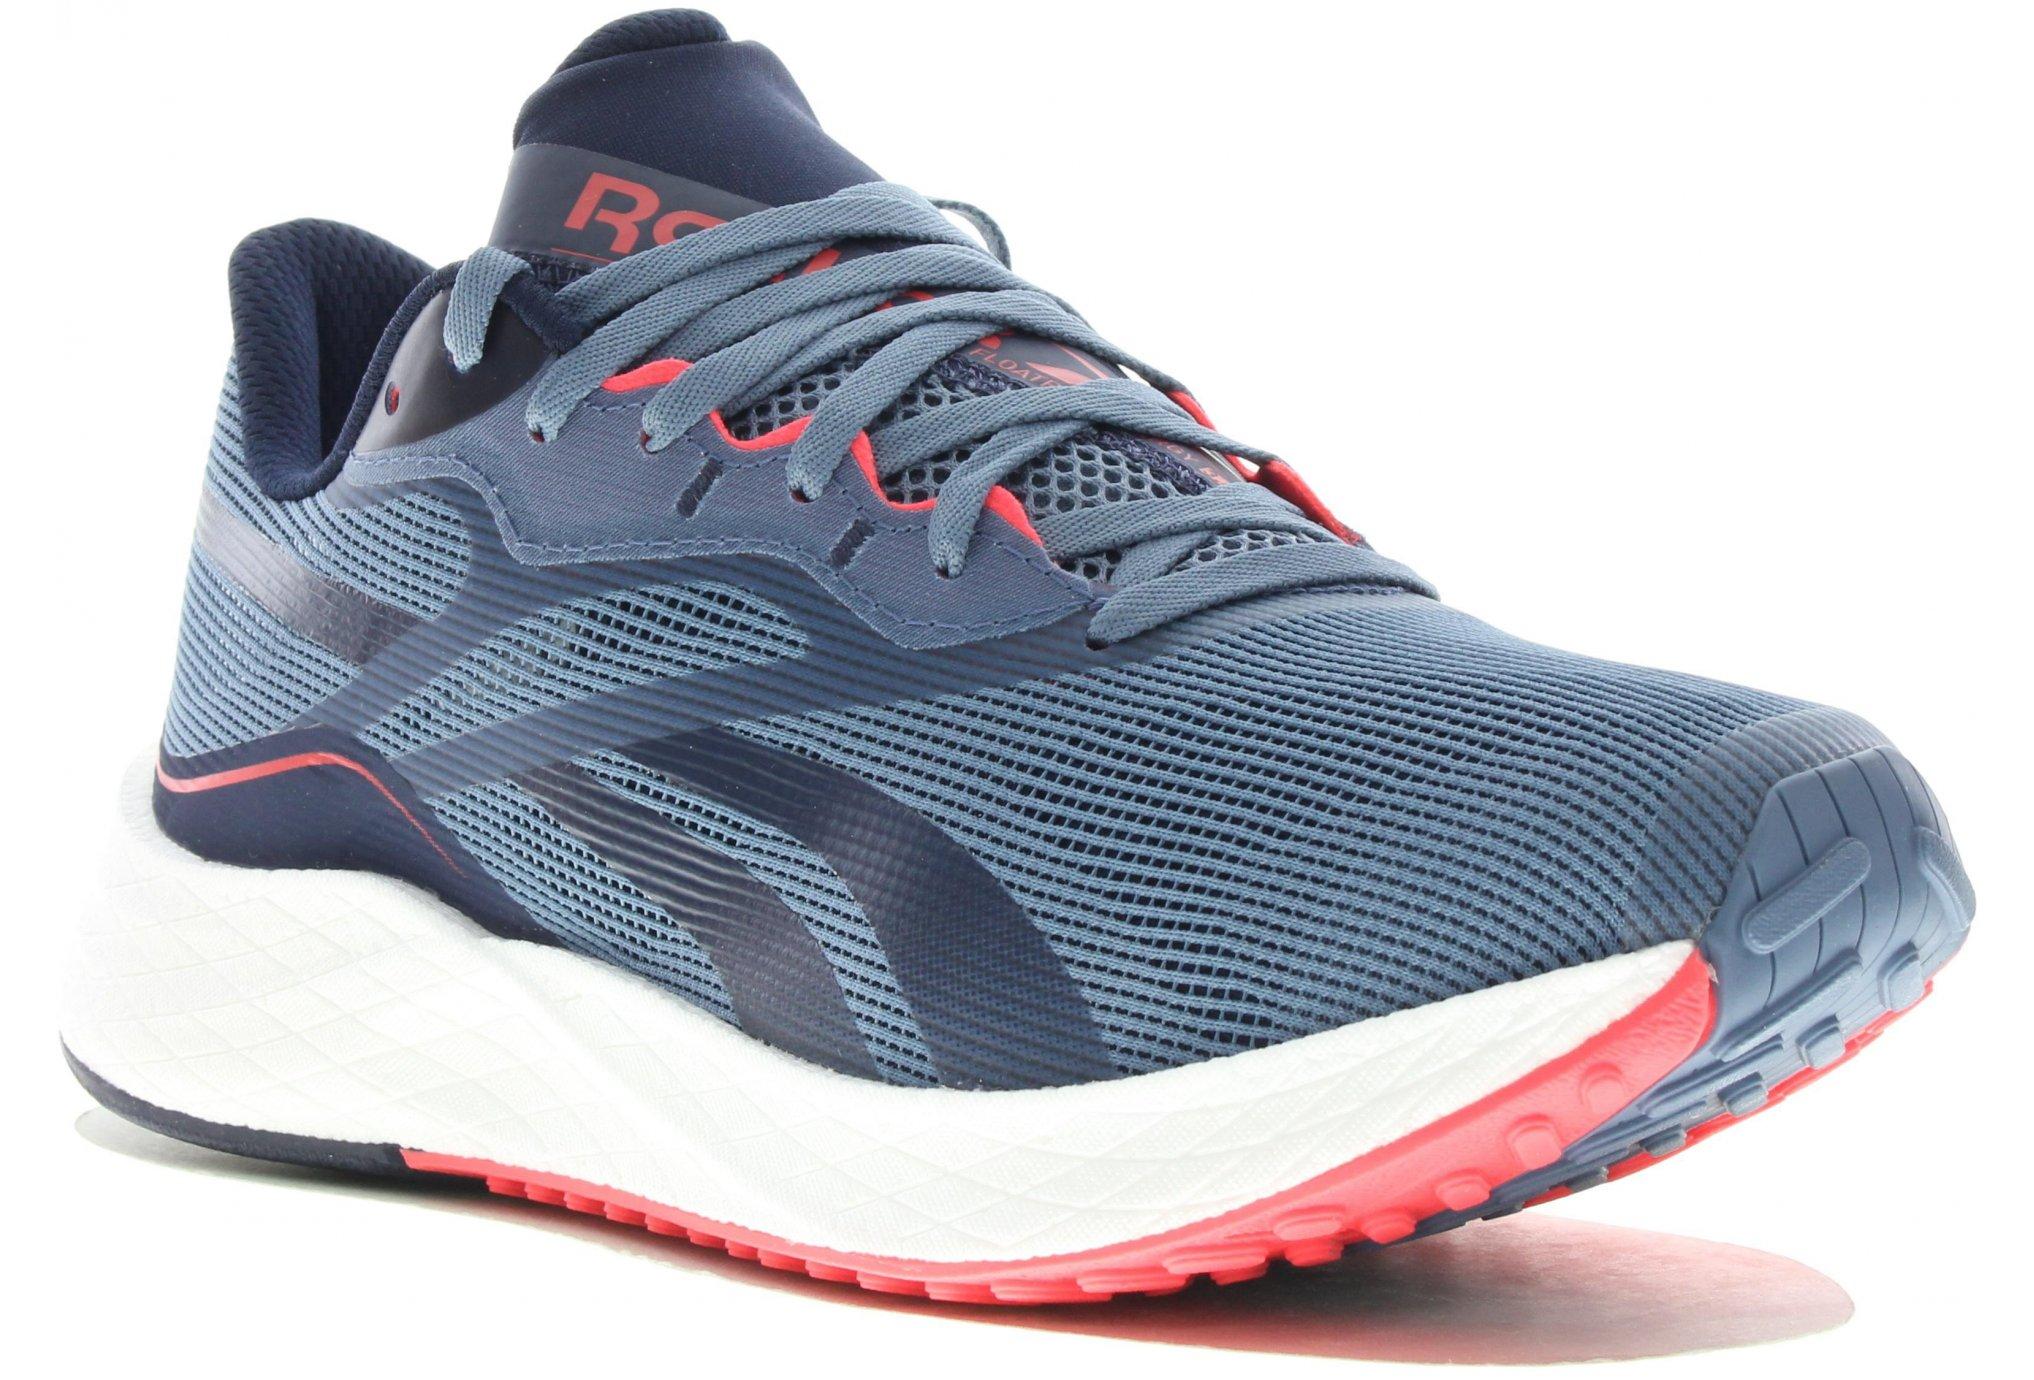 Reebok Floatride Energy 3.0 M Chaussures homme